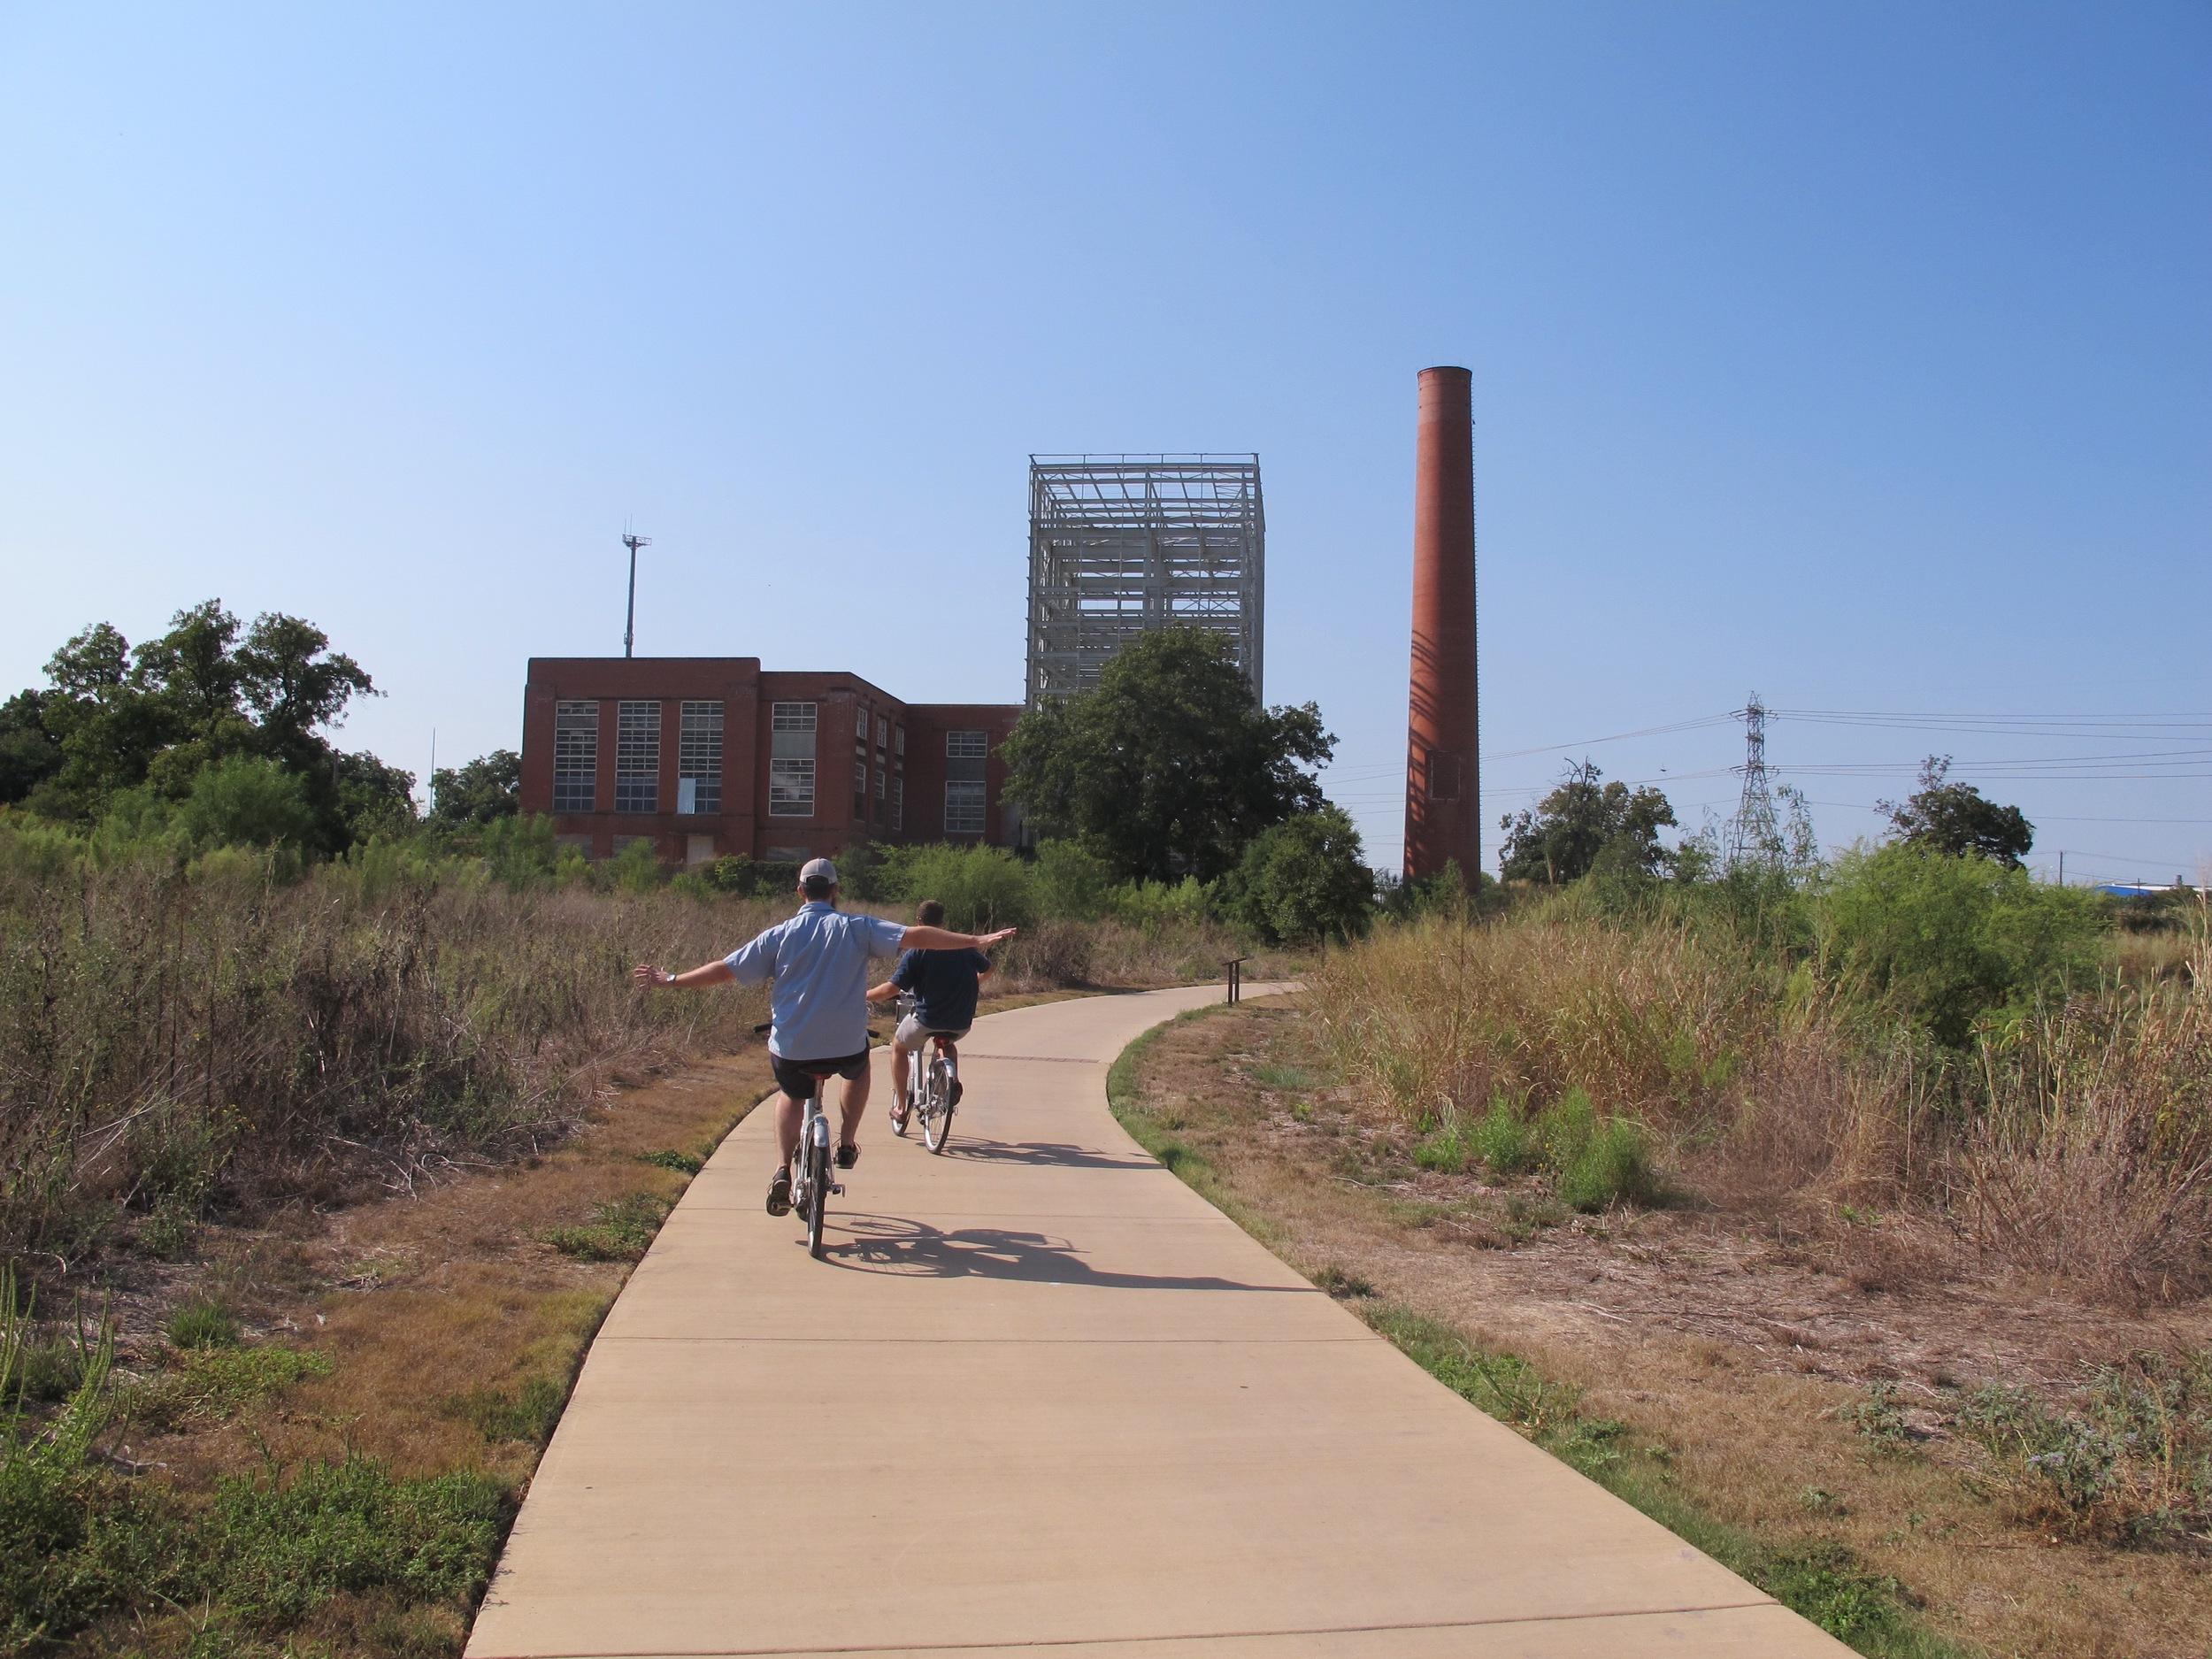 Mission Trail, San Antonio, Texas